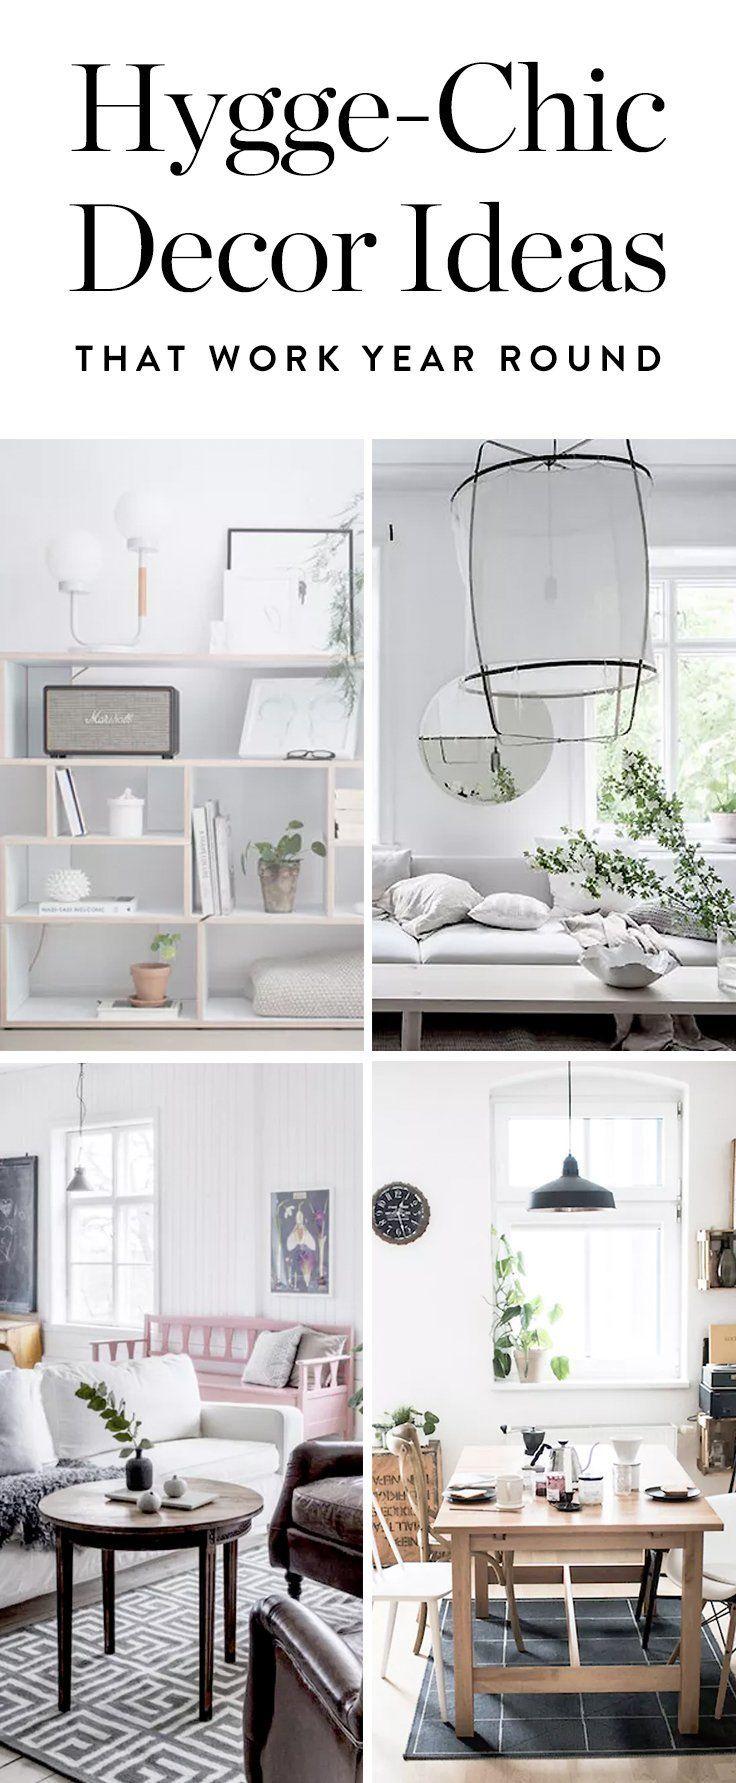 10 hygge chic styling ideas that work all year round - Kitchen Decorating Ideas Pinterest